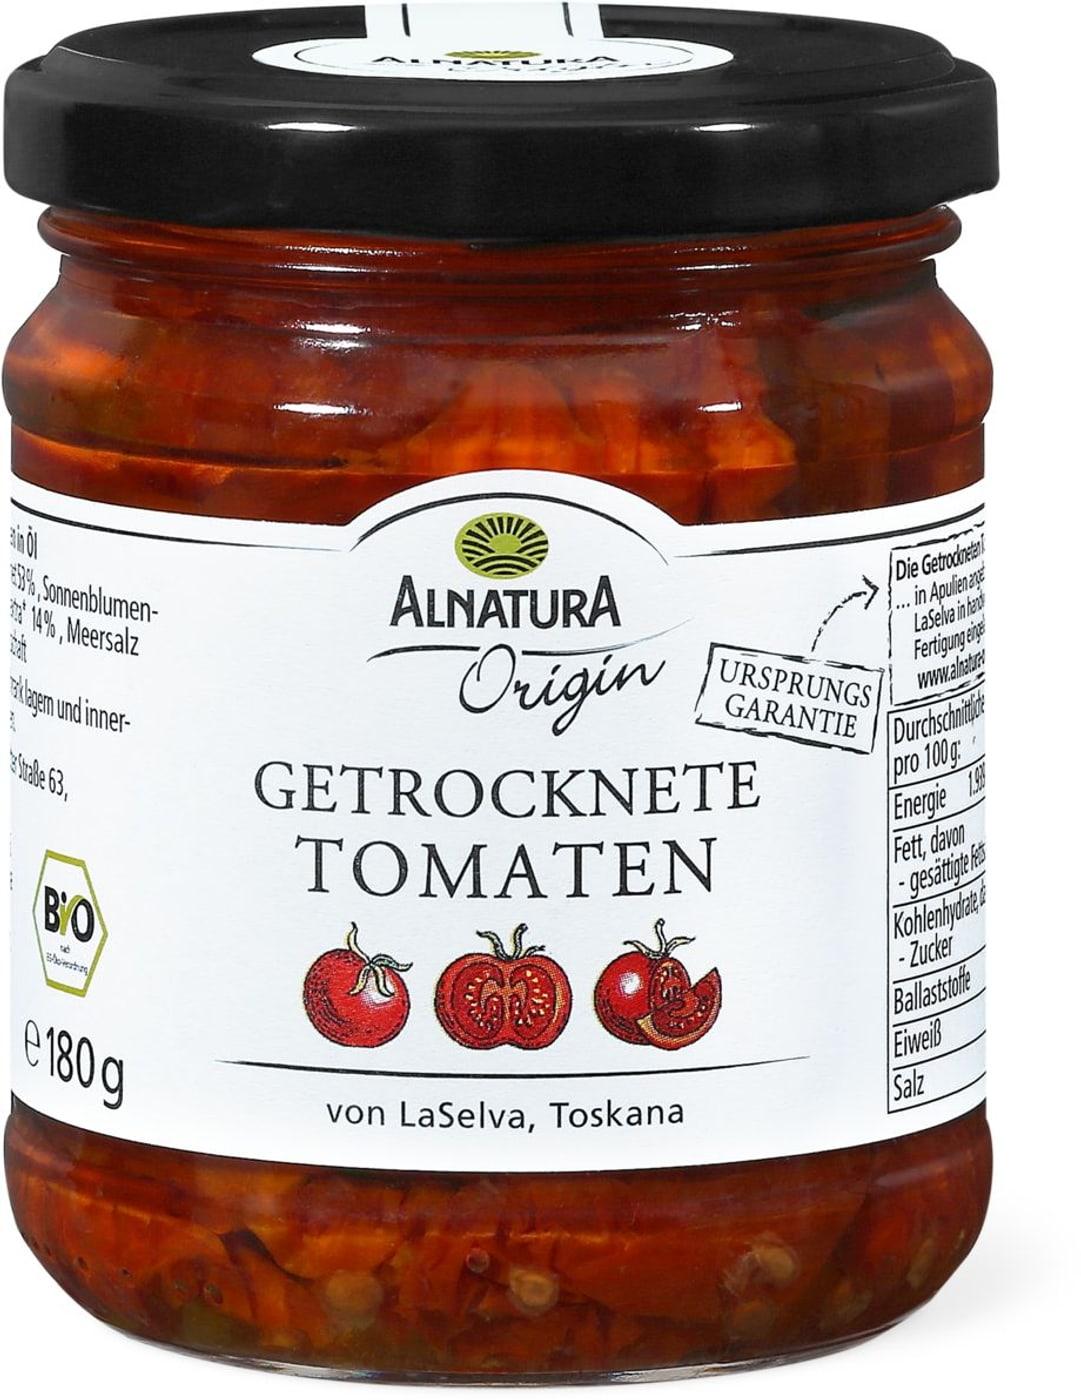 alnatura origin getrocknete tomaten migros. Black Bedroom Furniture Sets. Home Design Ideas